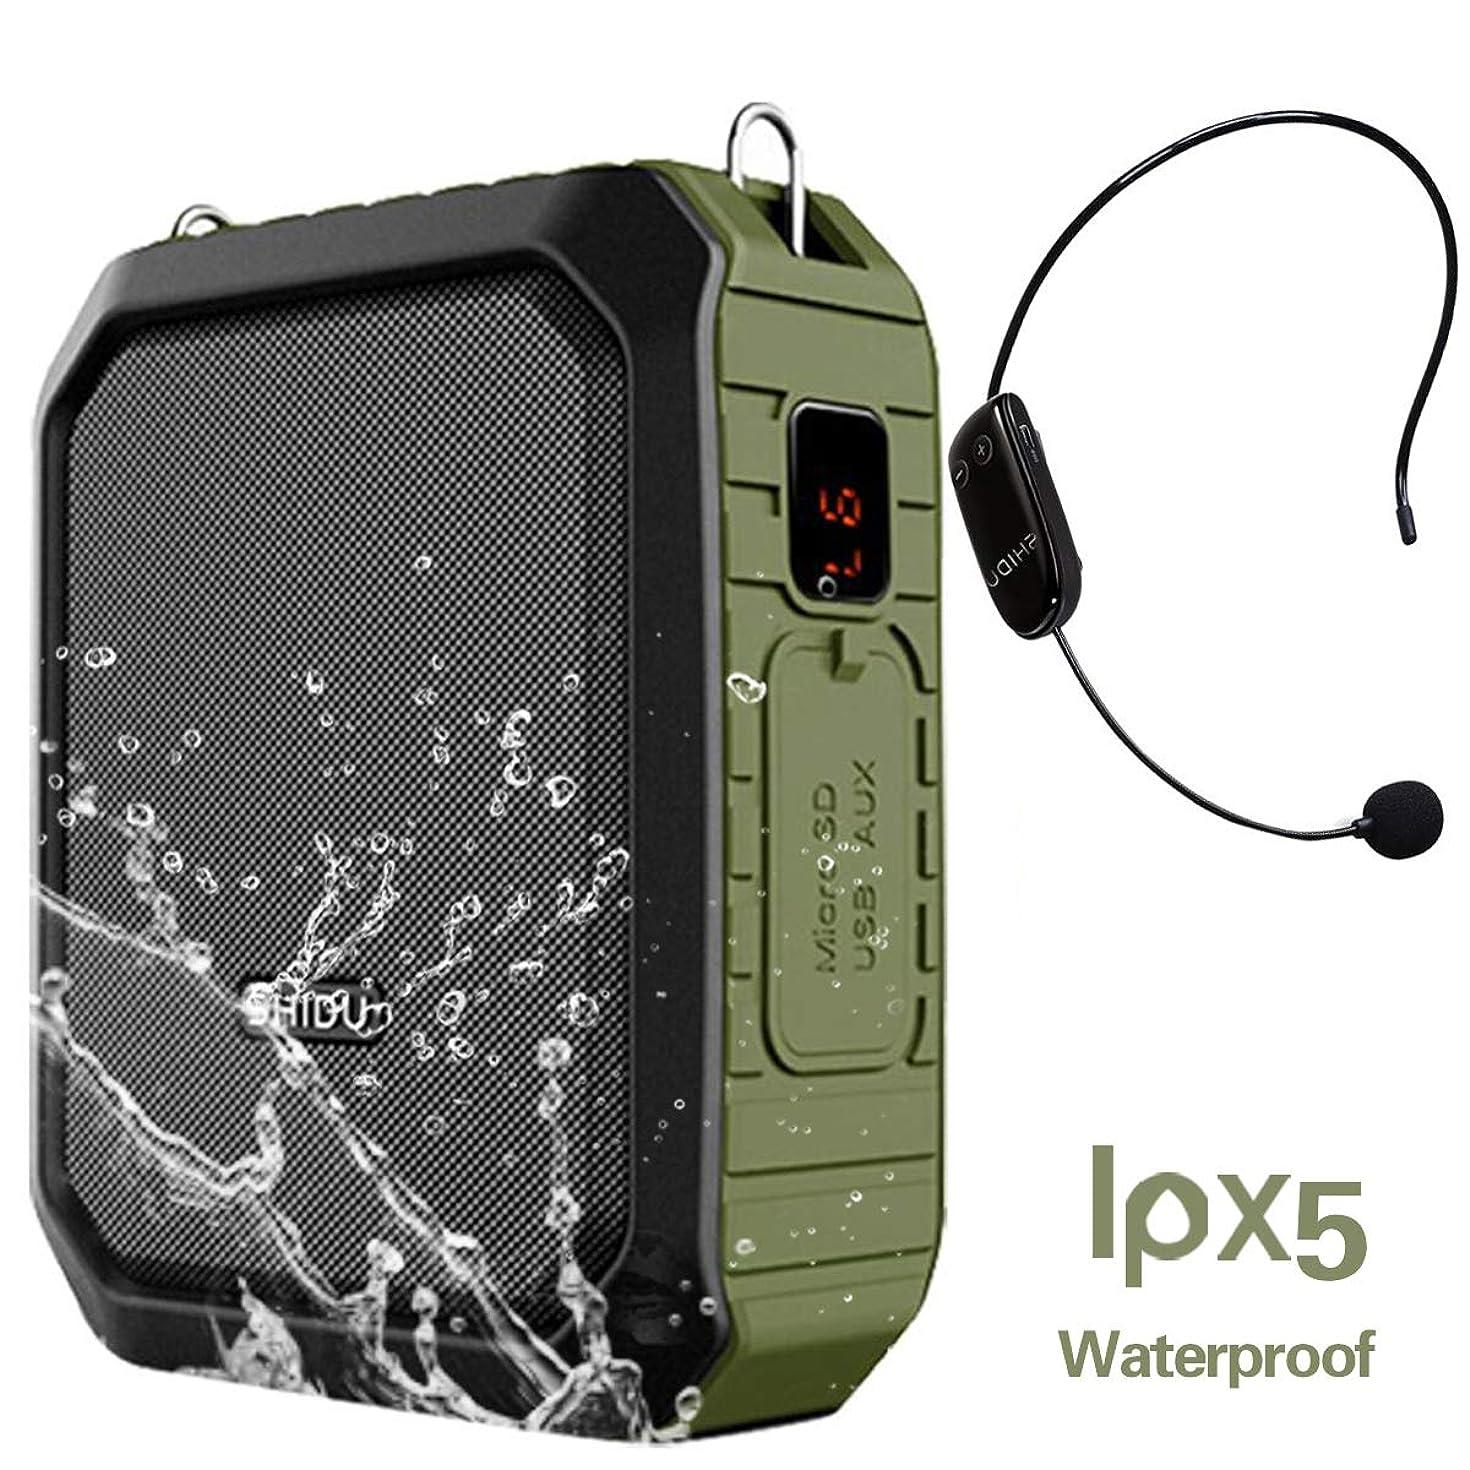 Voice Amplifier Wireless Headset Microphone IPX5 Waterproof Bluetooth Mini Pa Speaker 18W 4400mAh Rechargeable Portable Waistband Voice Amplifier for Teachers, Trainers, Karaoke or Outdoors